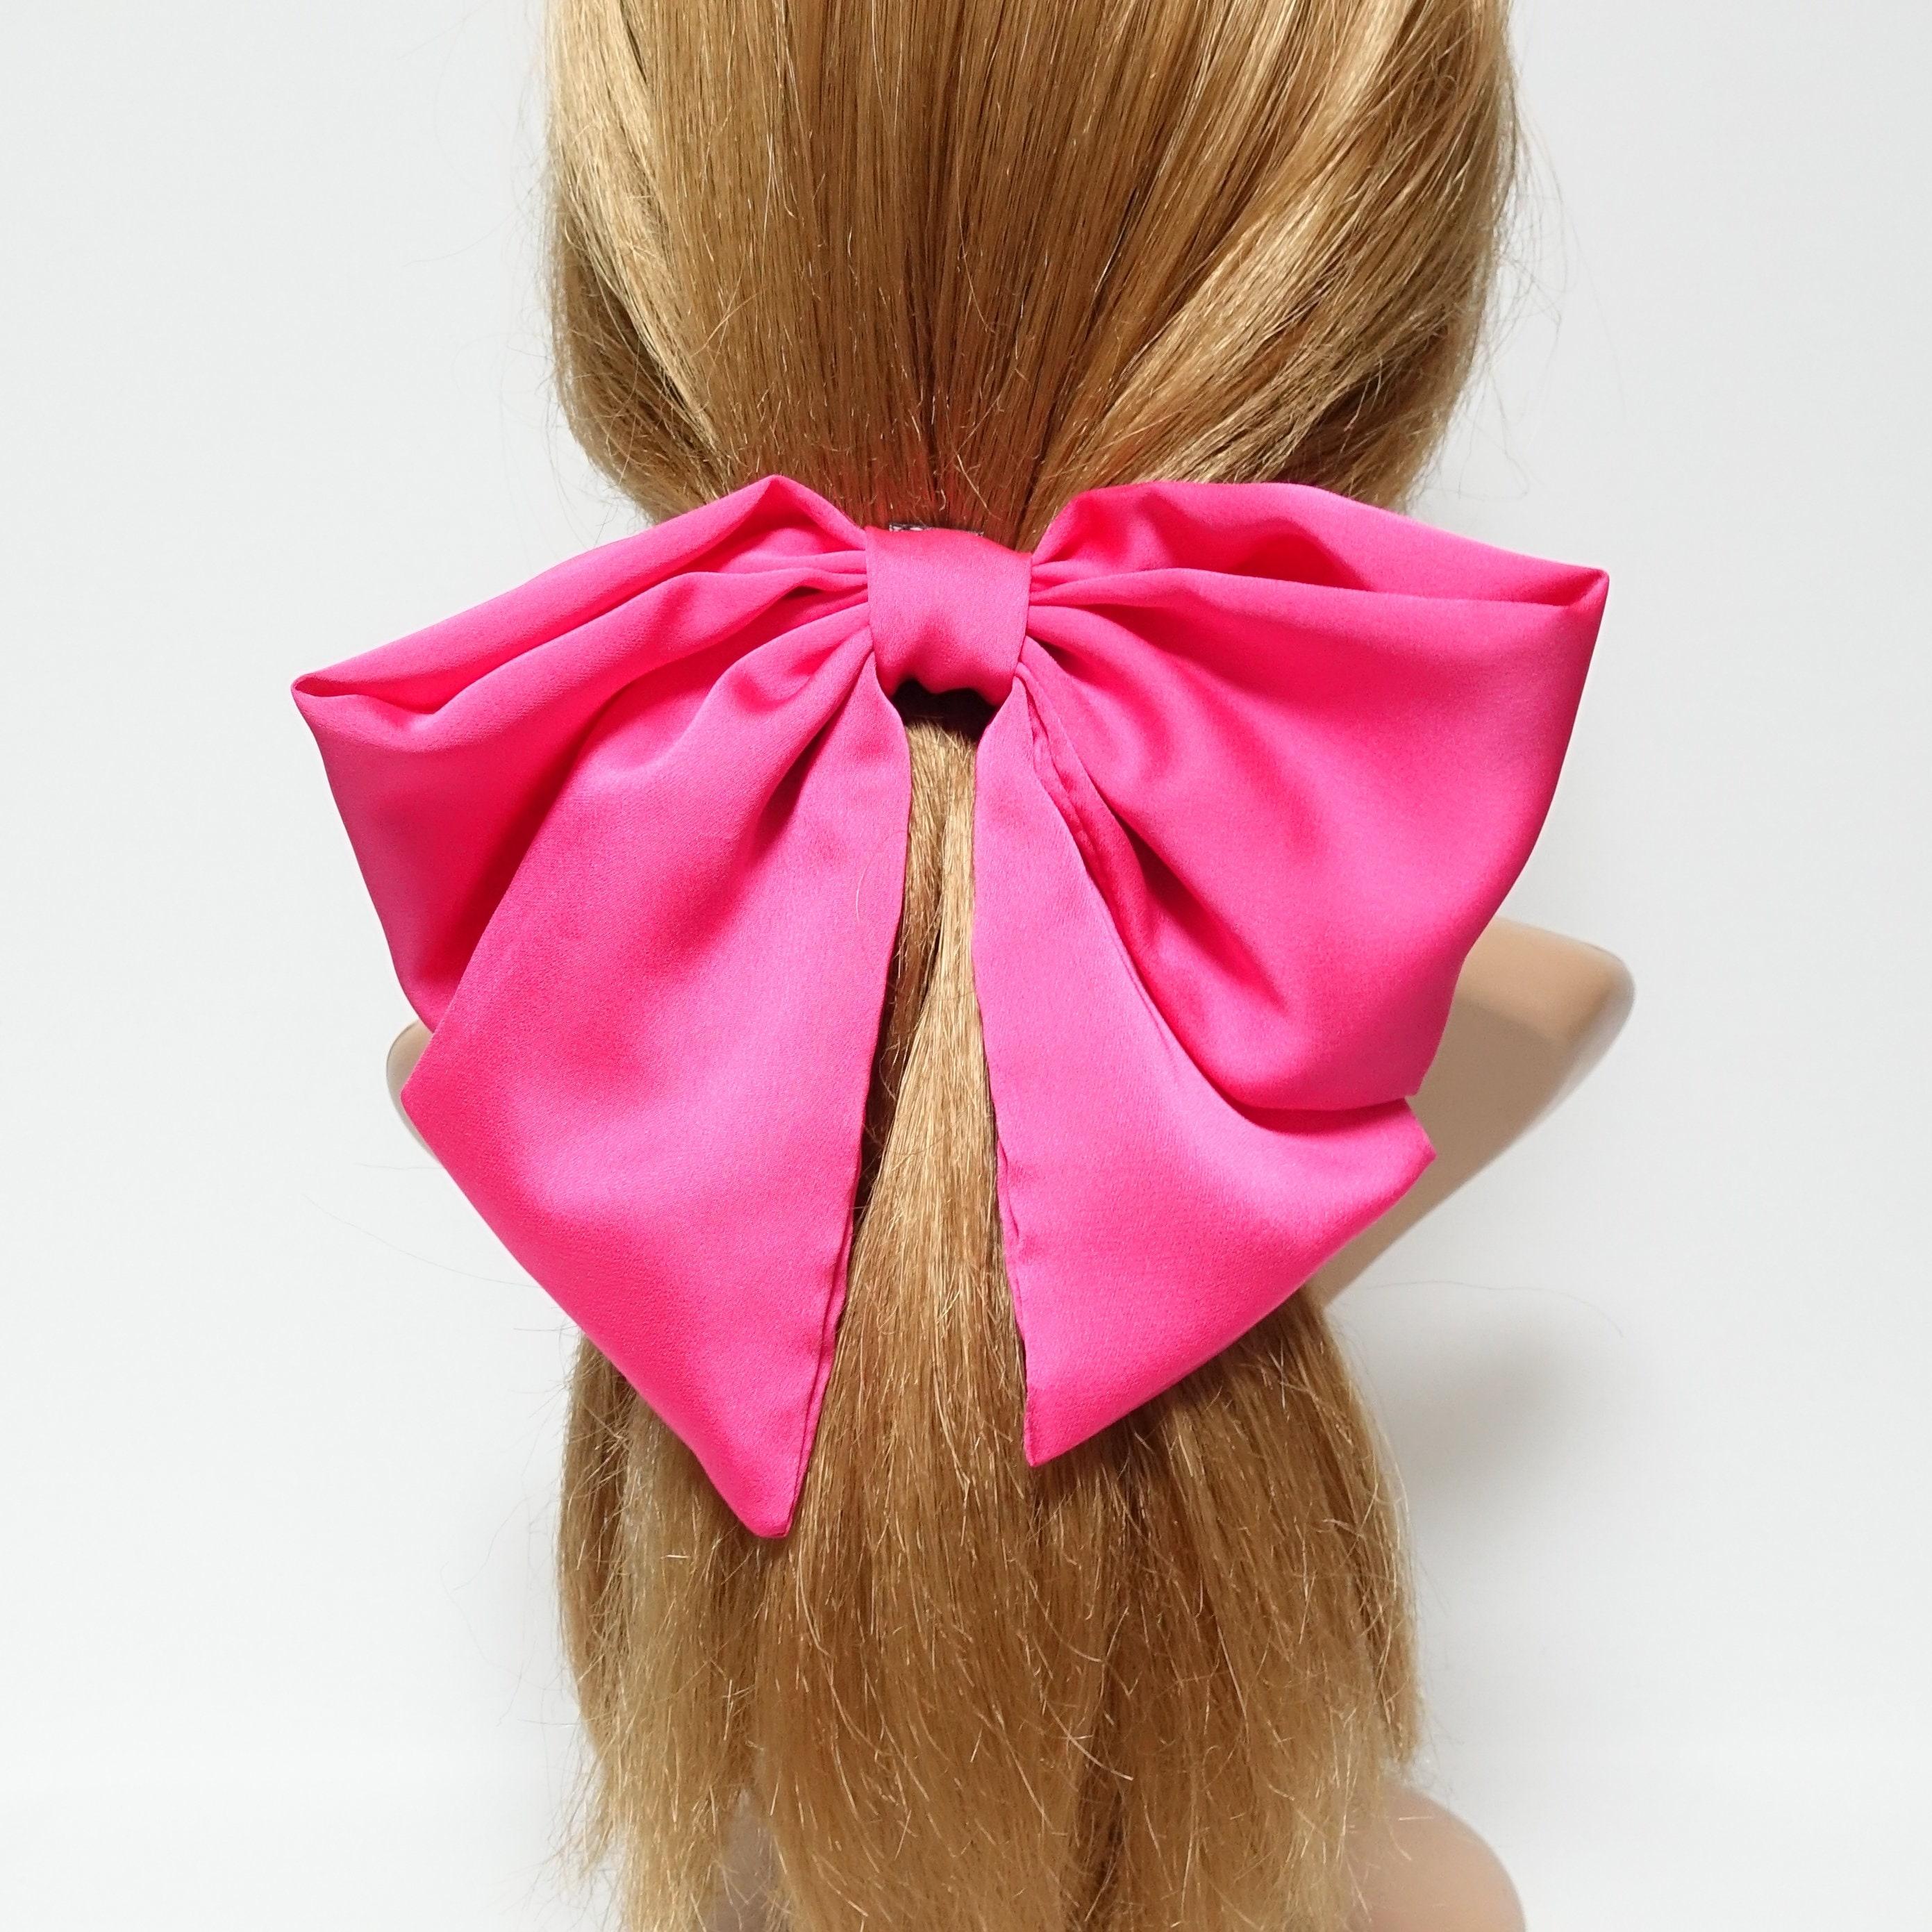 bc20bc481629 Satin big flip floppy hair bow french barrette stylish large | Etsy